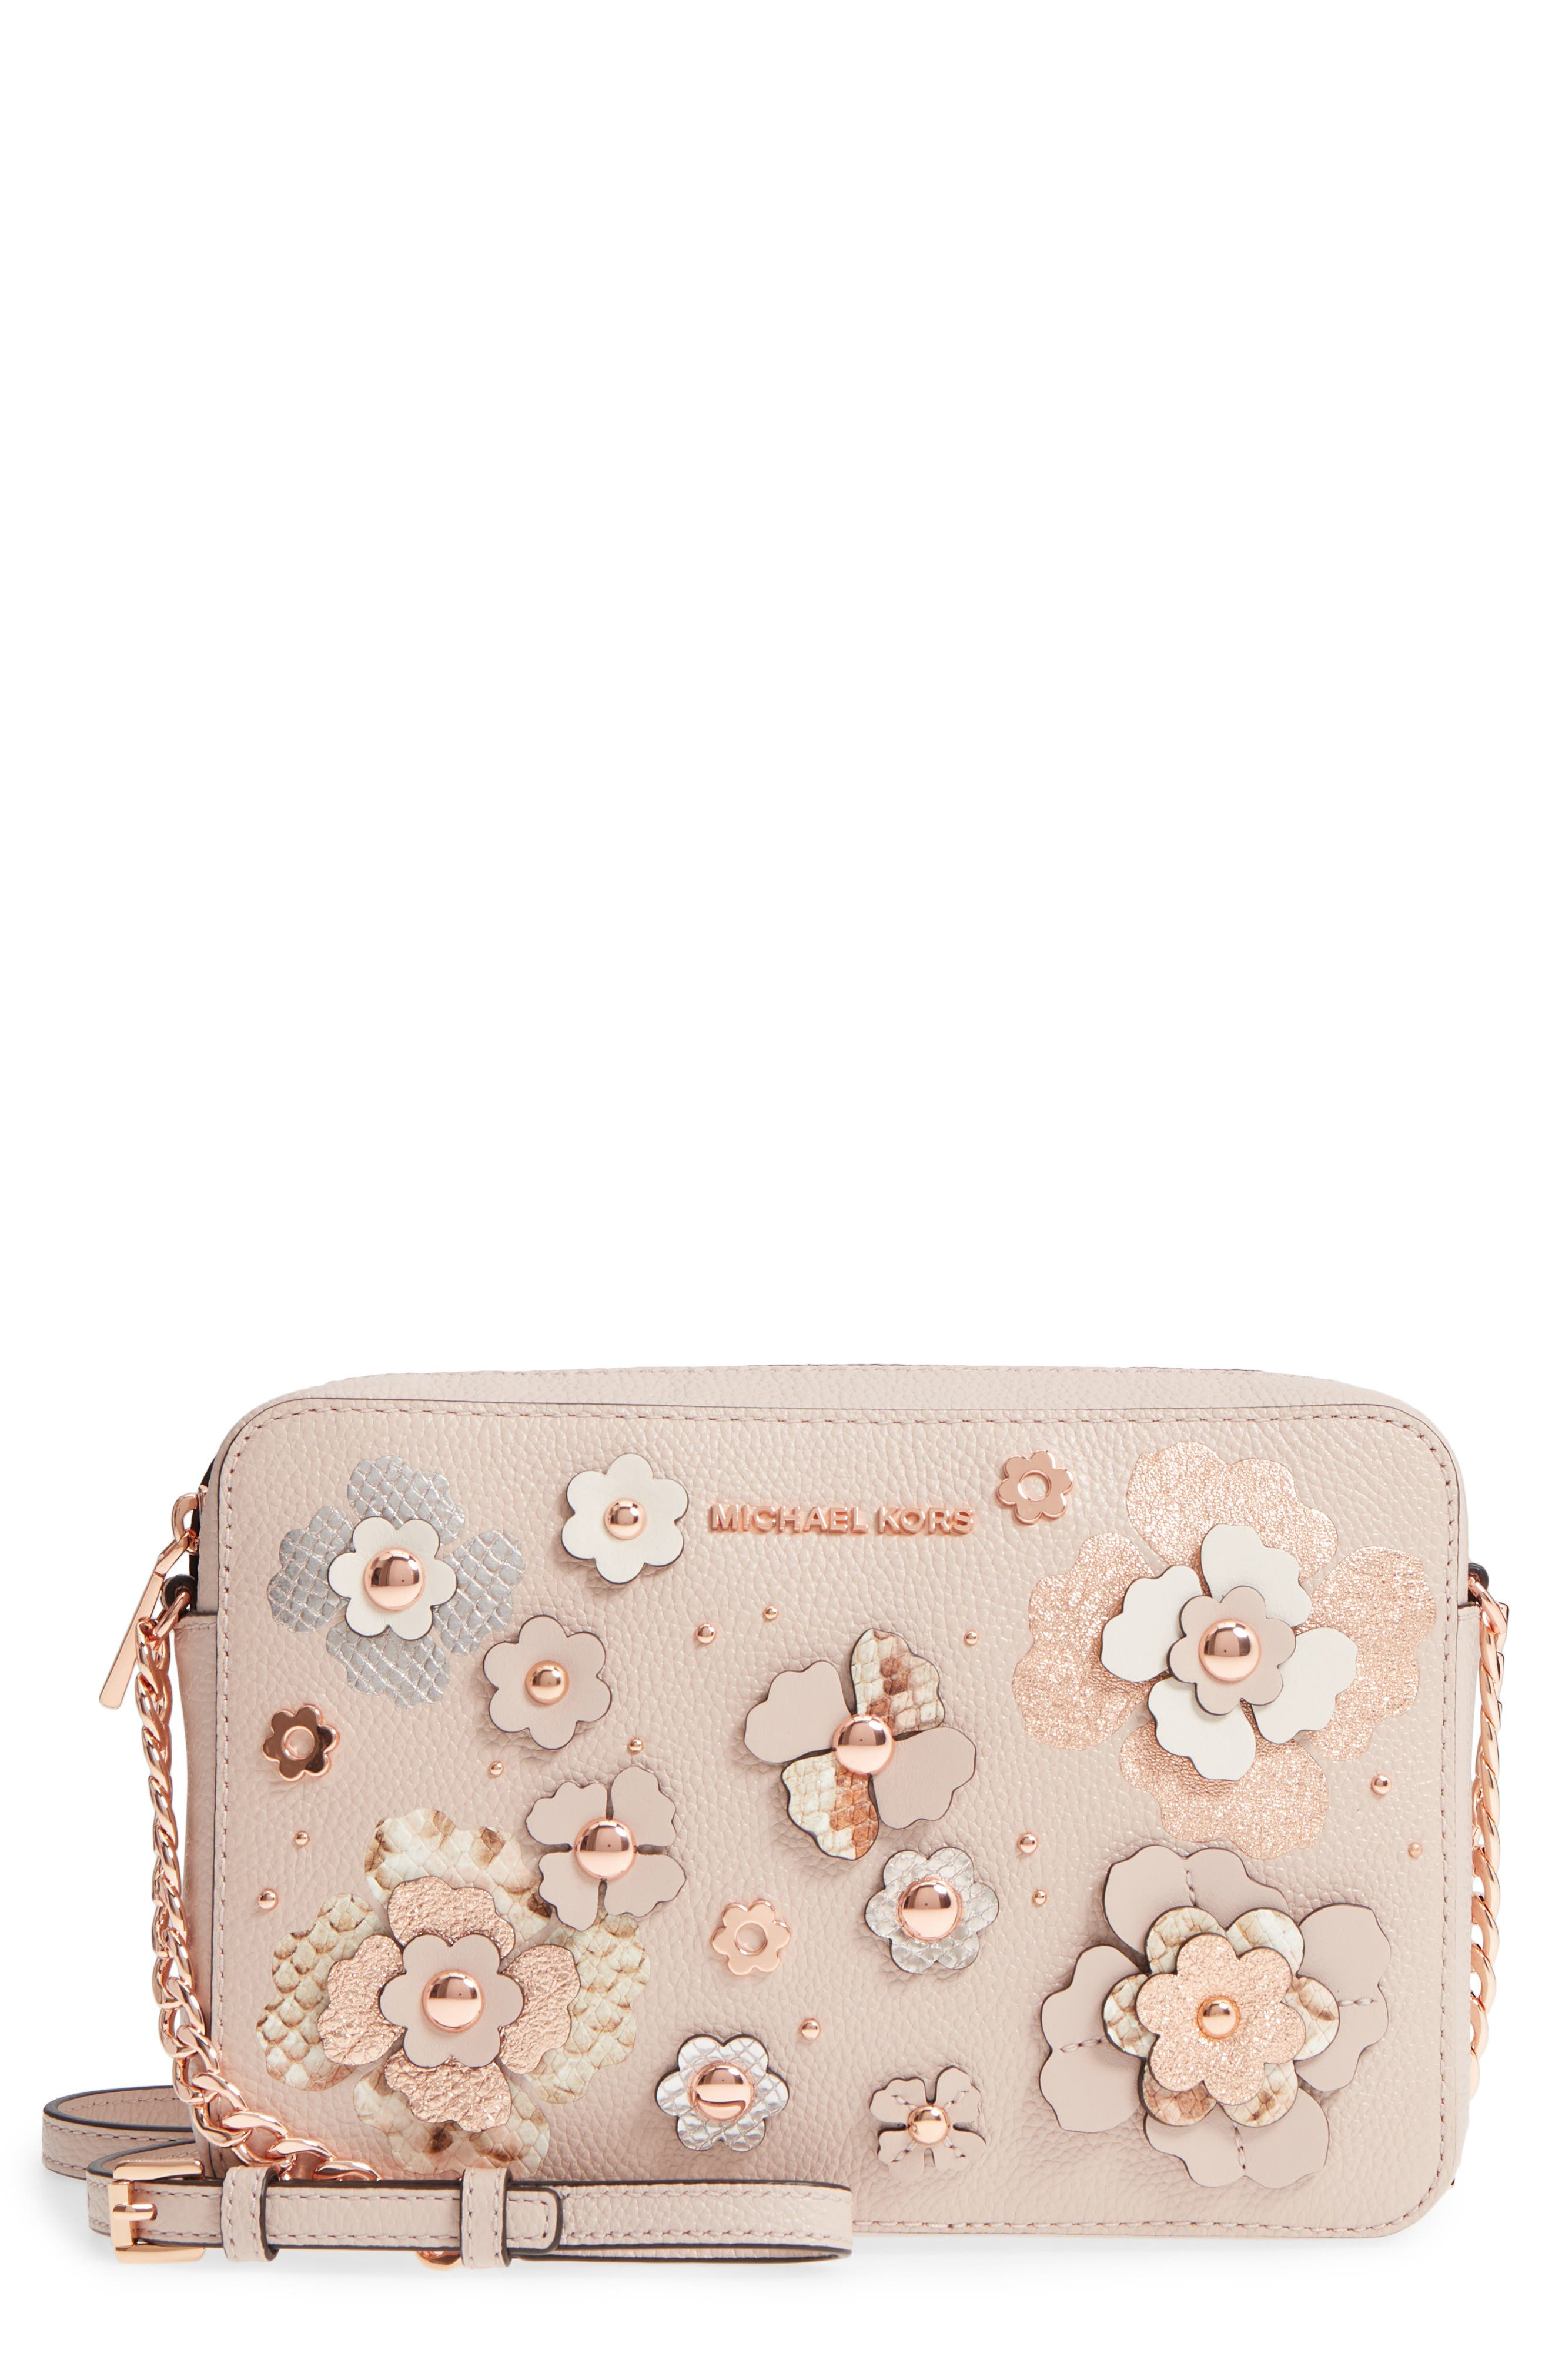 MICHAEL Michael Kors Jet Set Floral Embellished Leather Crossbody Bag,                             Main thumbnail 1, color,                             650